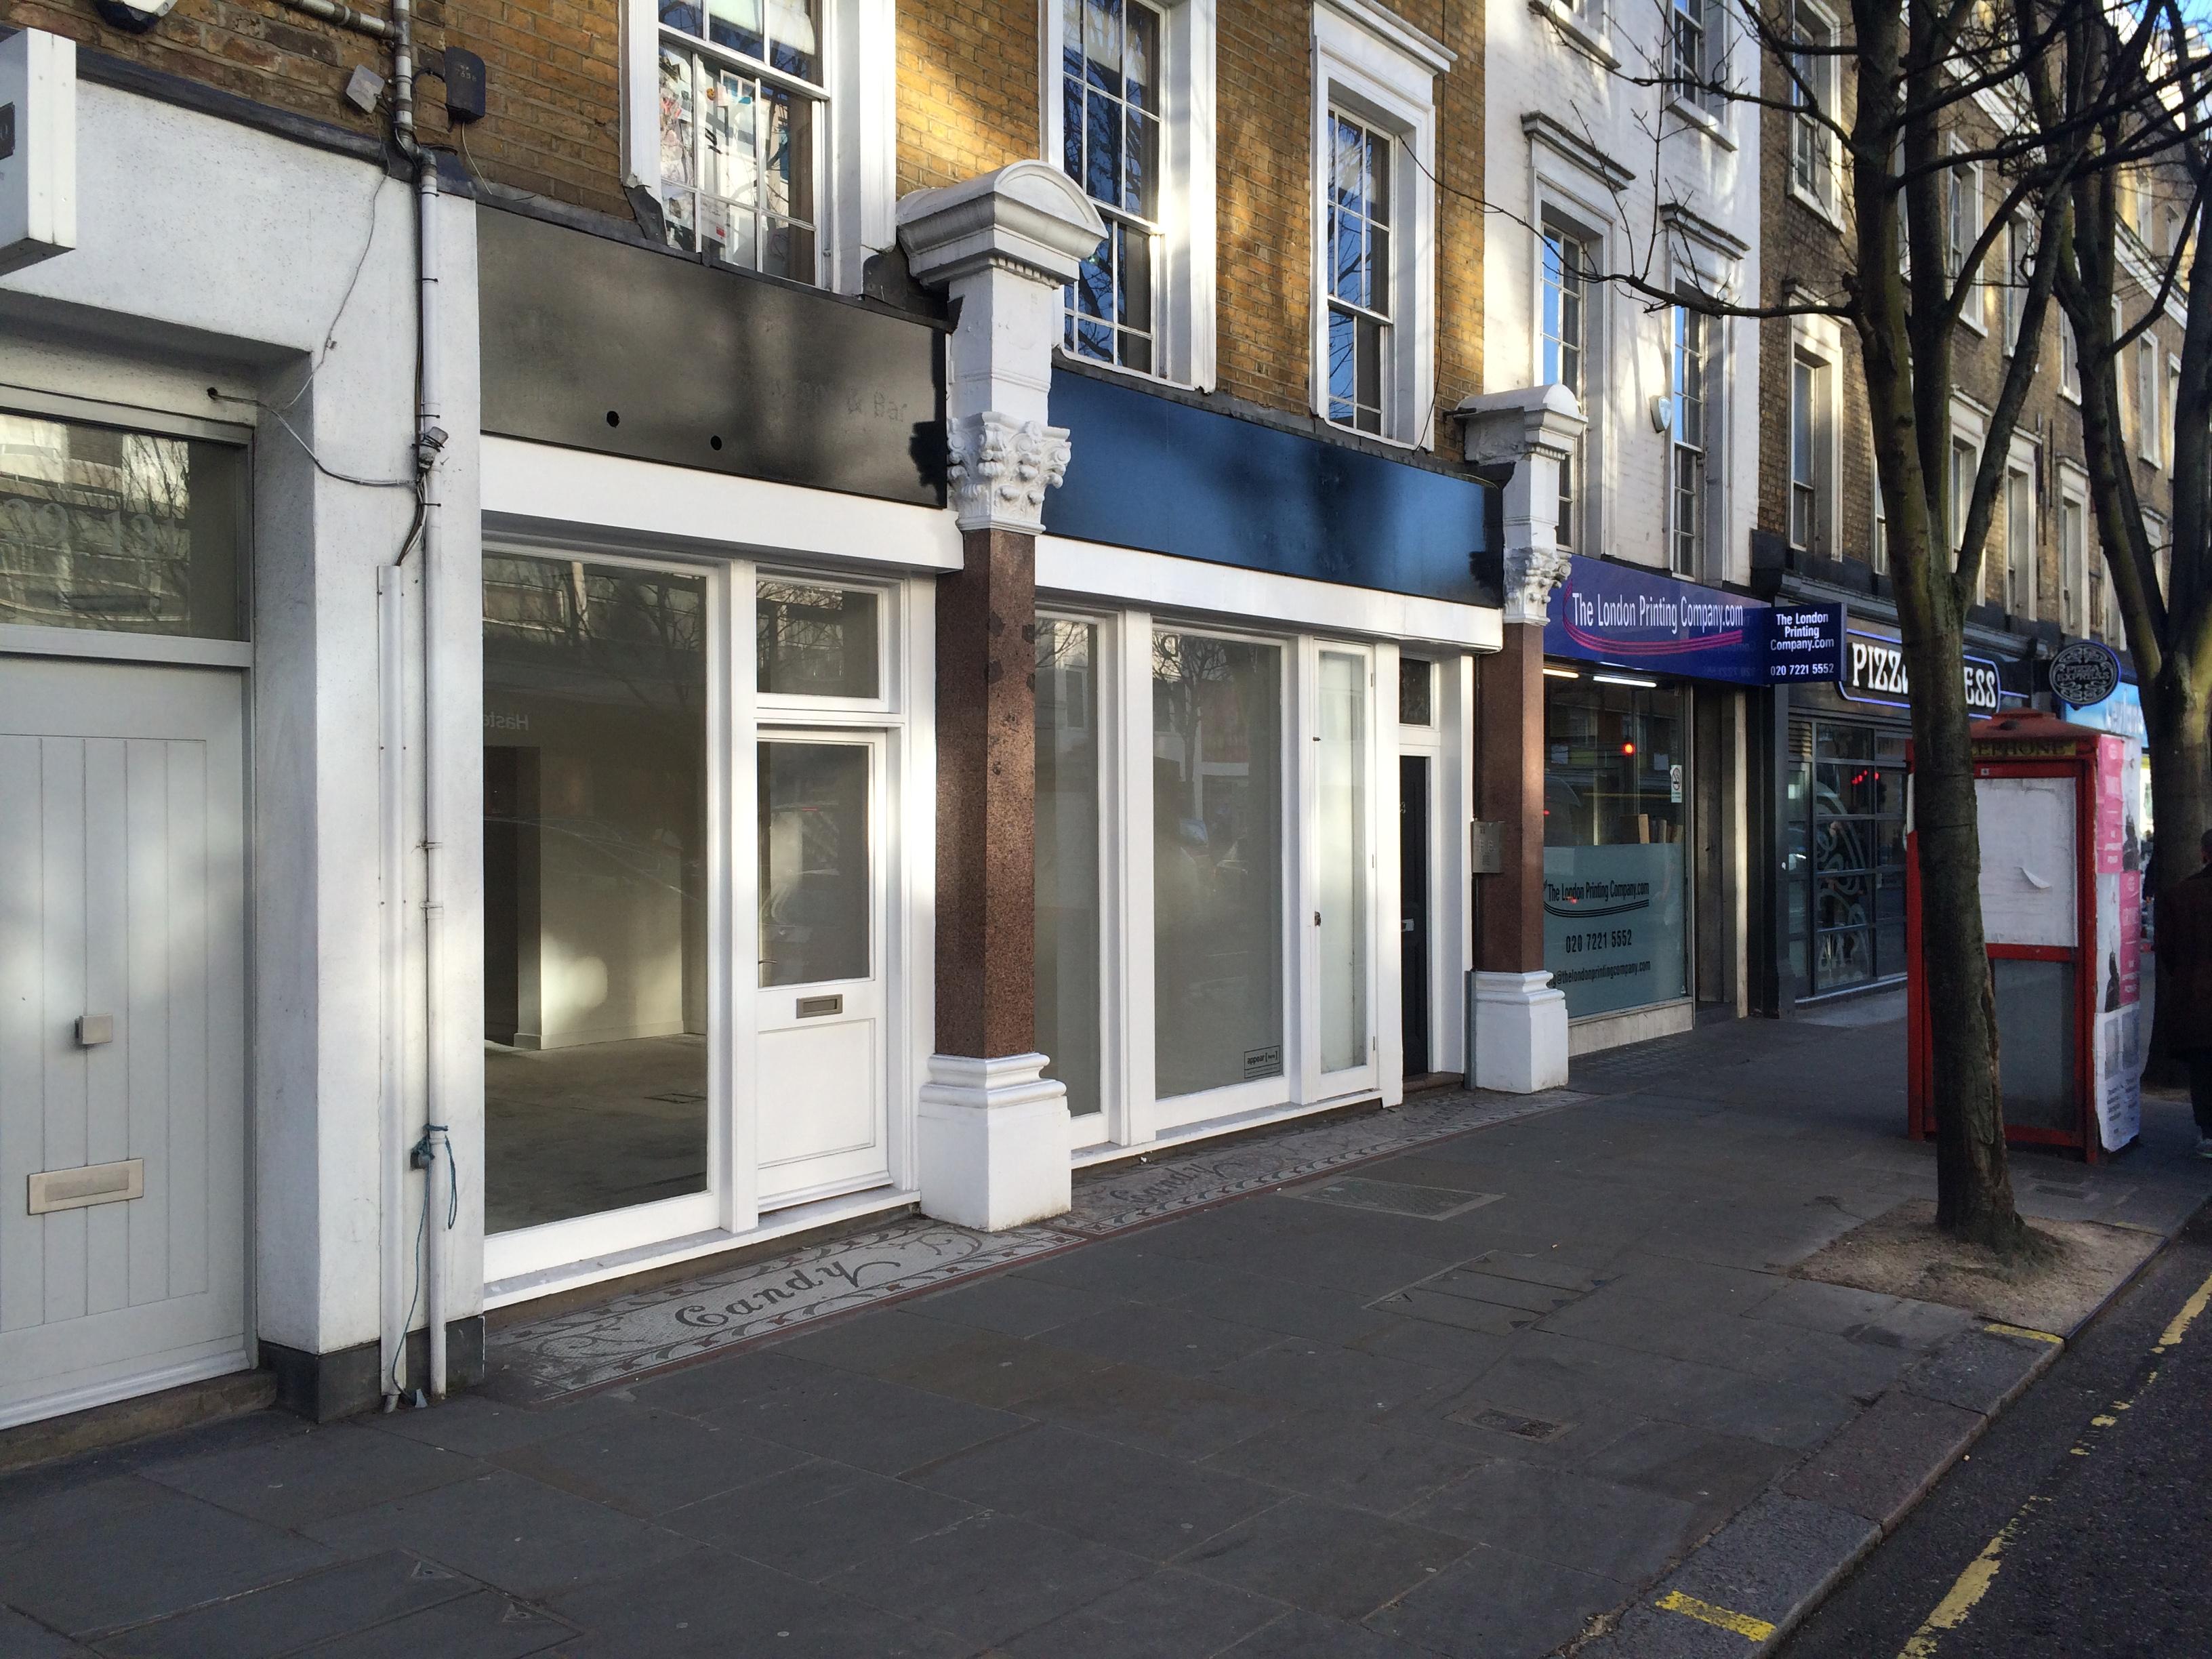 133 notting hill gate london w11 miles commercial. Black Bedroom Furniture Sets. Home Design Ideas